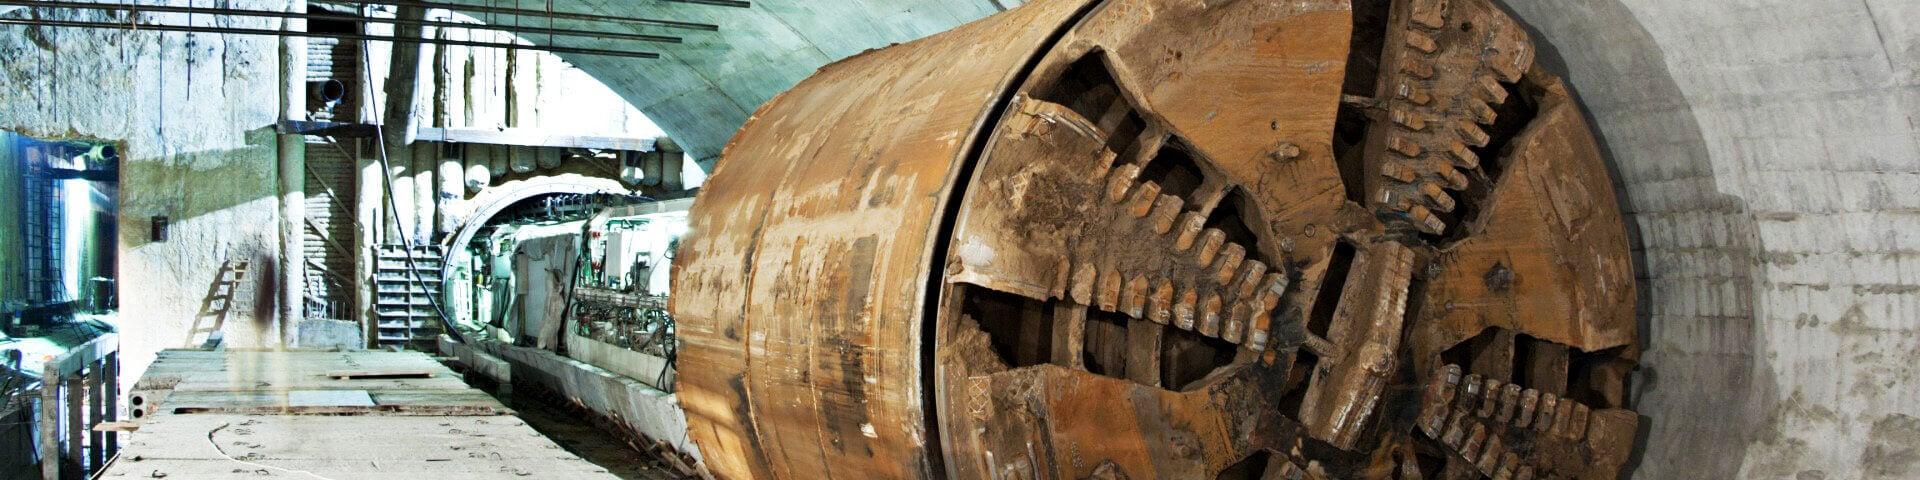 Tunnel drilling herobanner 1920x480